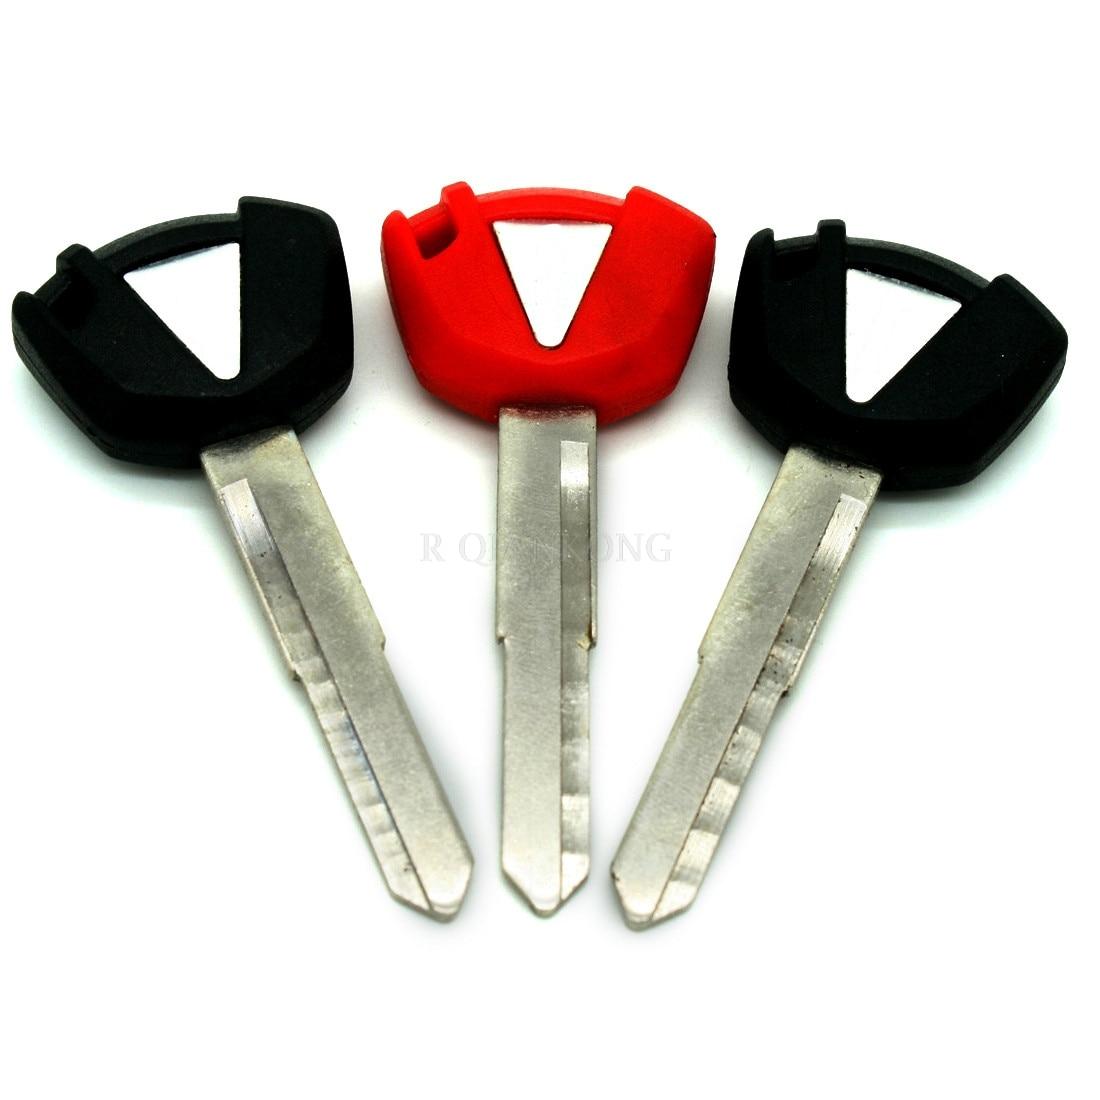 Motorcycle Accessories Motorcycle Keys Embryo For Kawasaki ZX-14R ZX-10R ZX-6R ZX-12R ZX 6R 10R Z750 Z1000 Z 750 1000